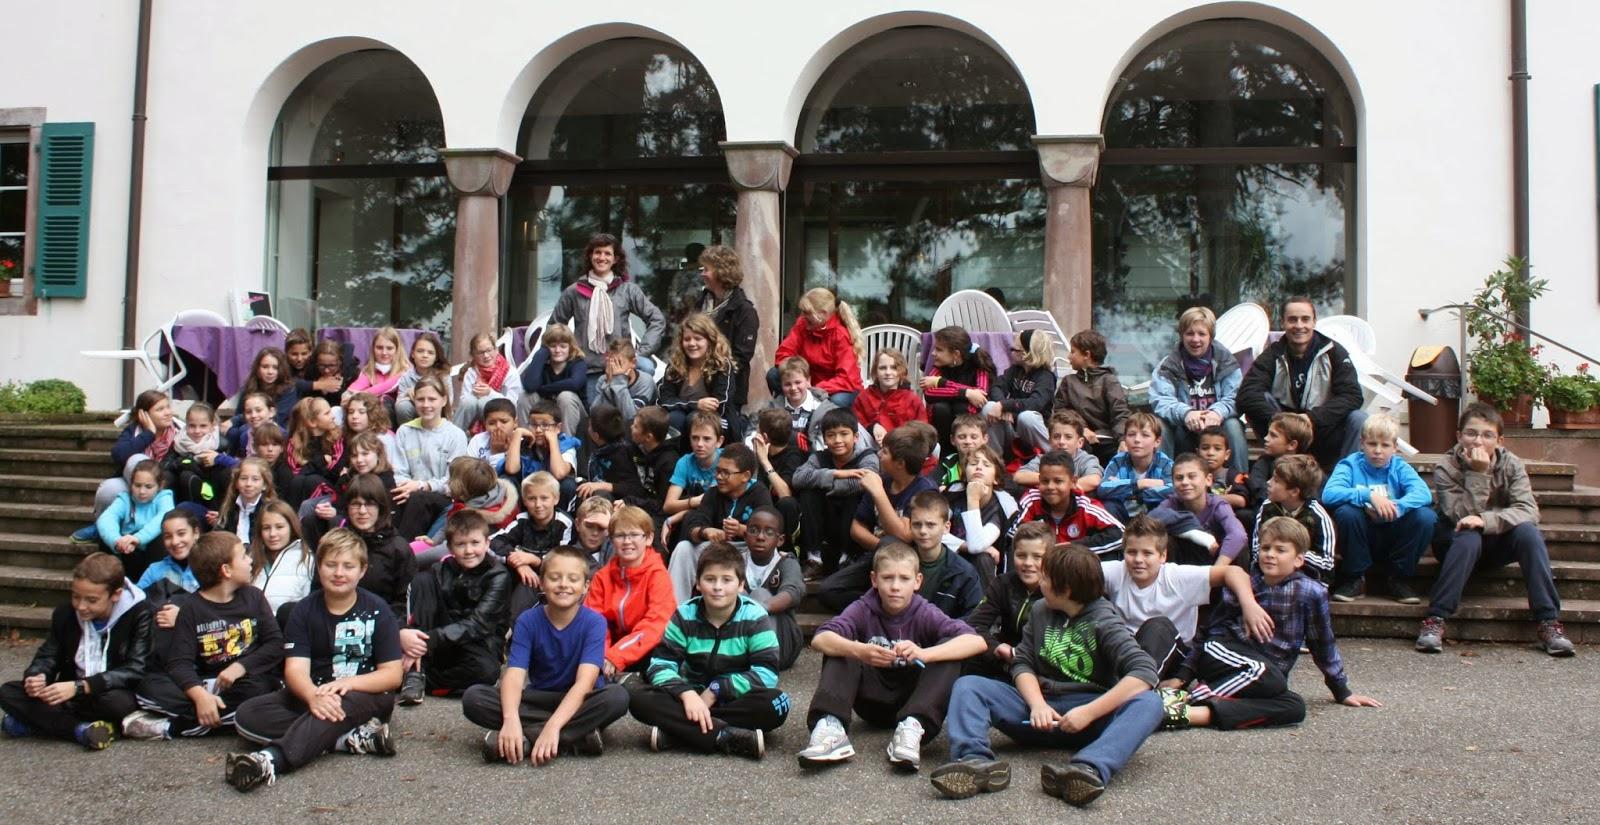 Rencontre taize strasbourg 2018